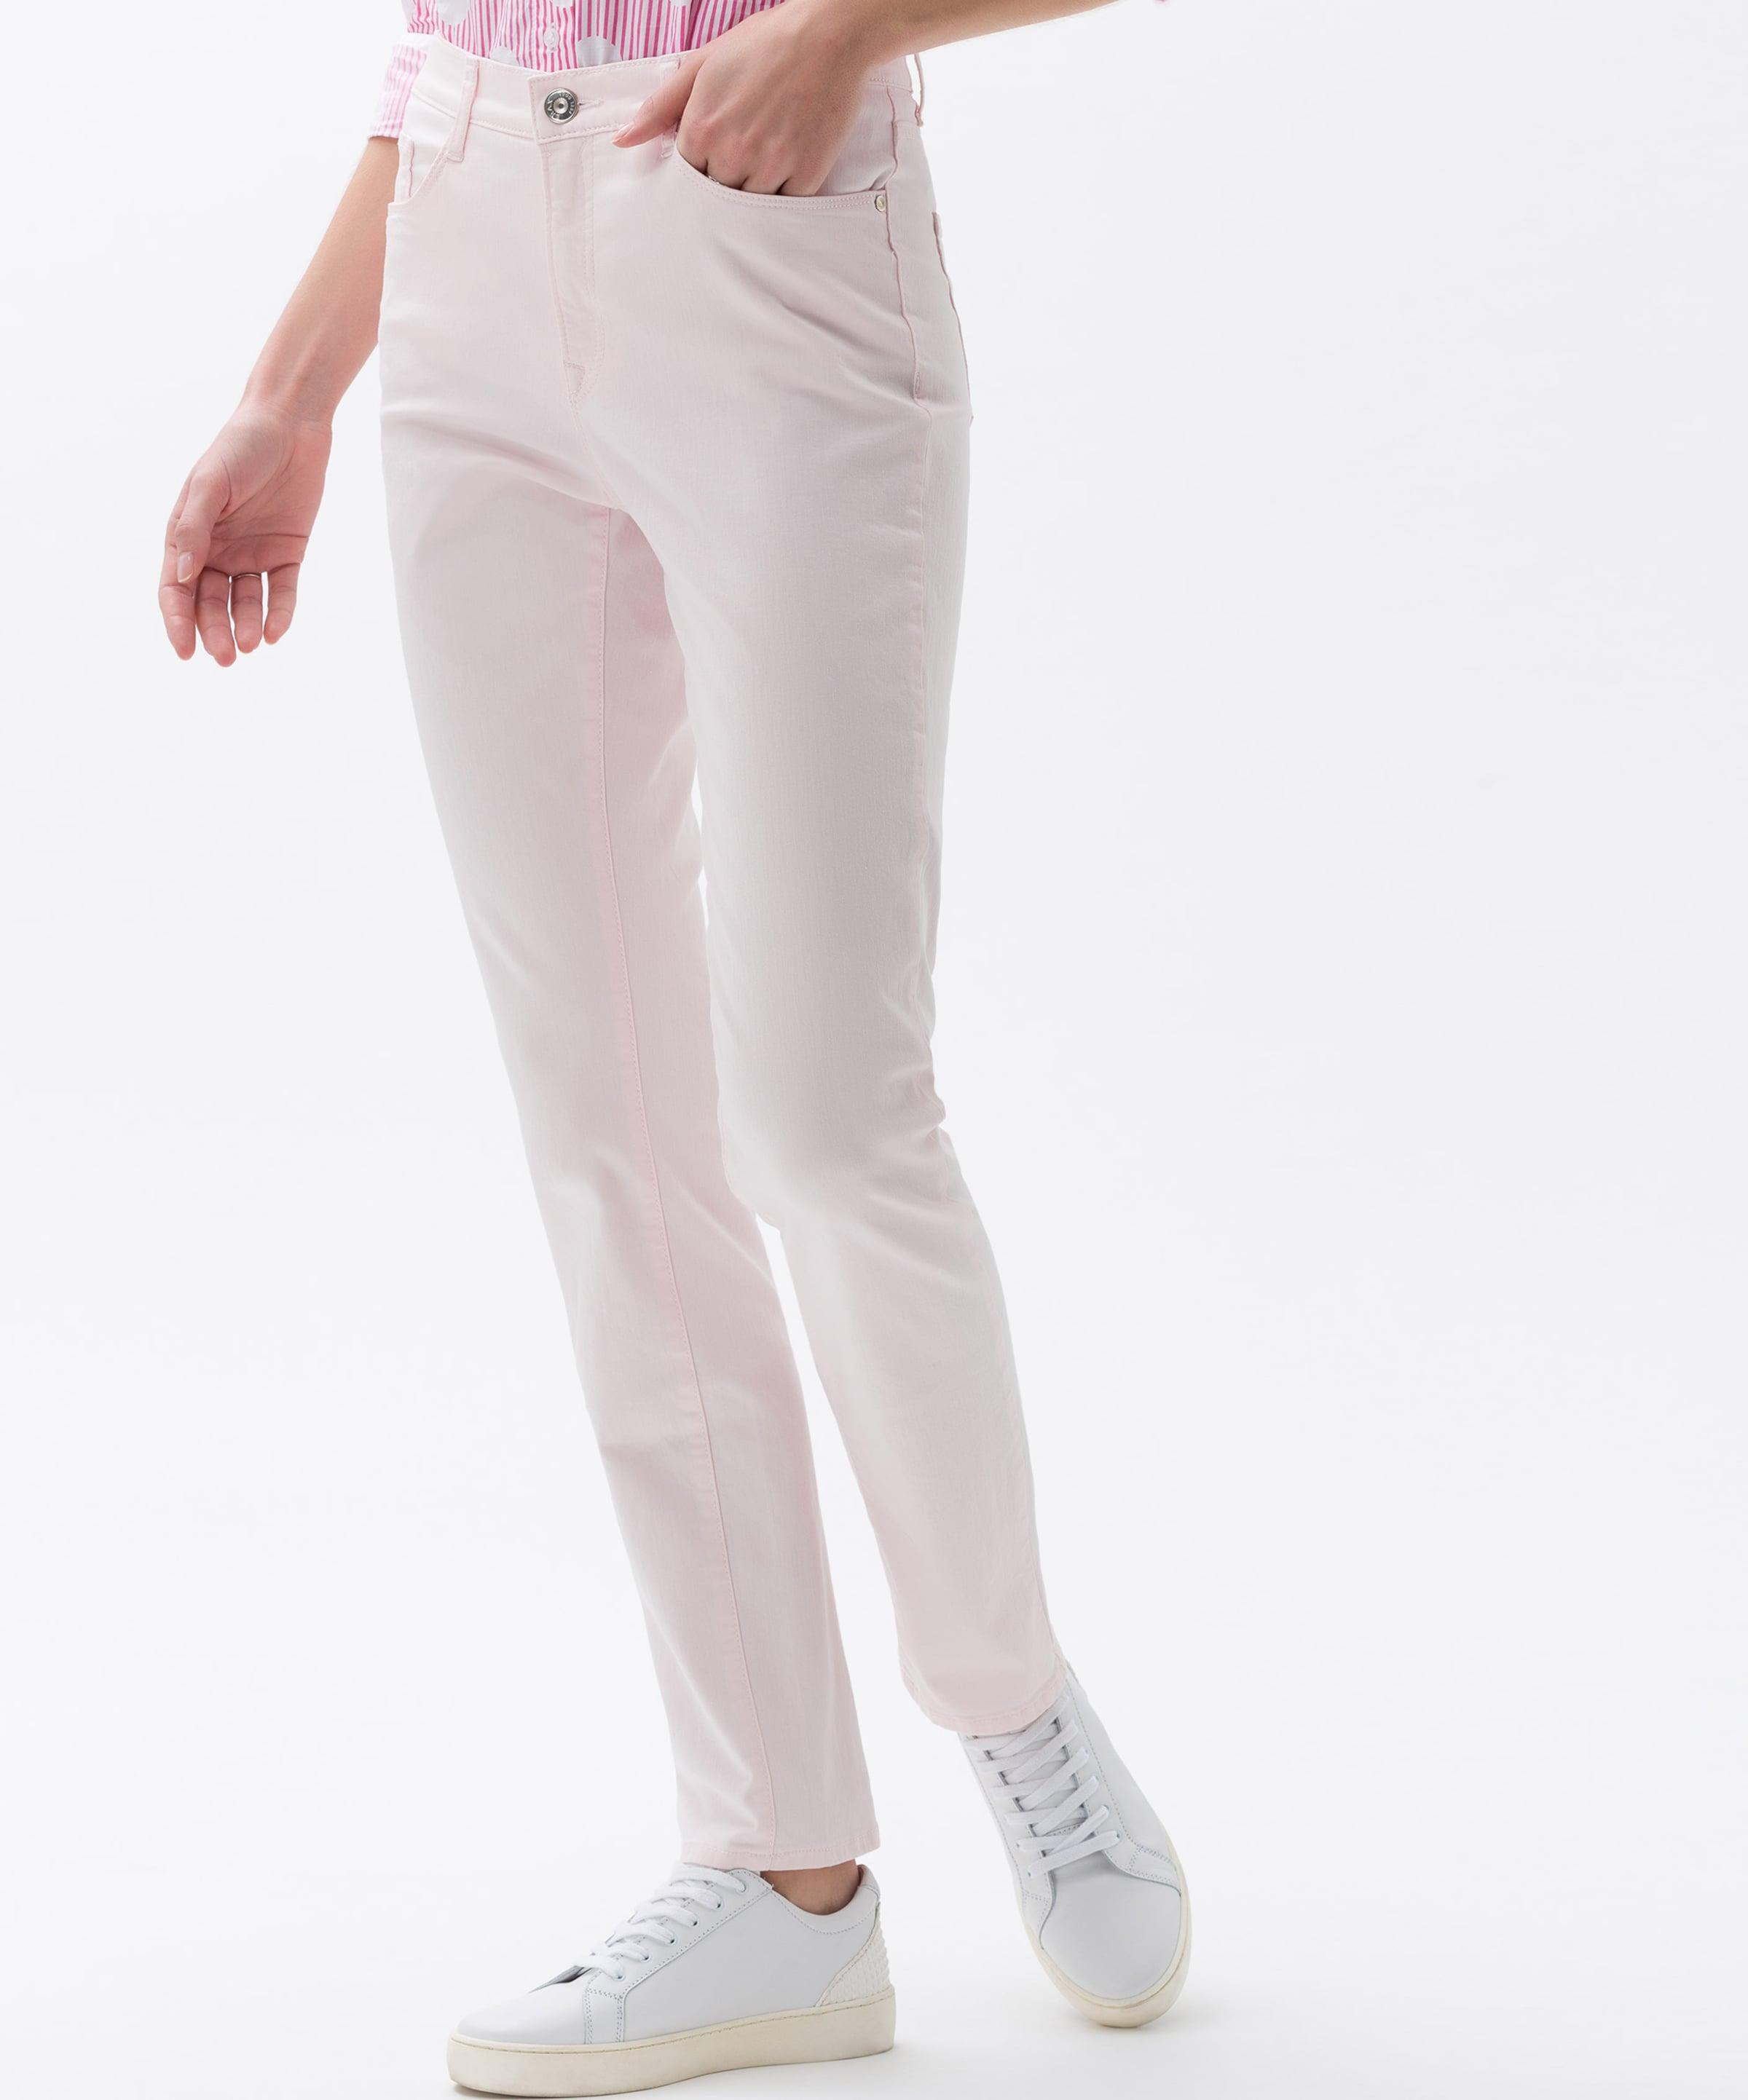 Jeans In 'mary' Brax 'mary' Rosa Jeans In Brax Brax 'mary' Jeans Rosa CBerdox